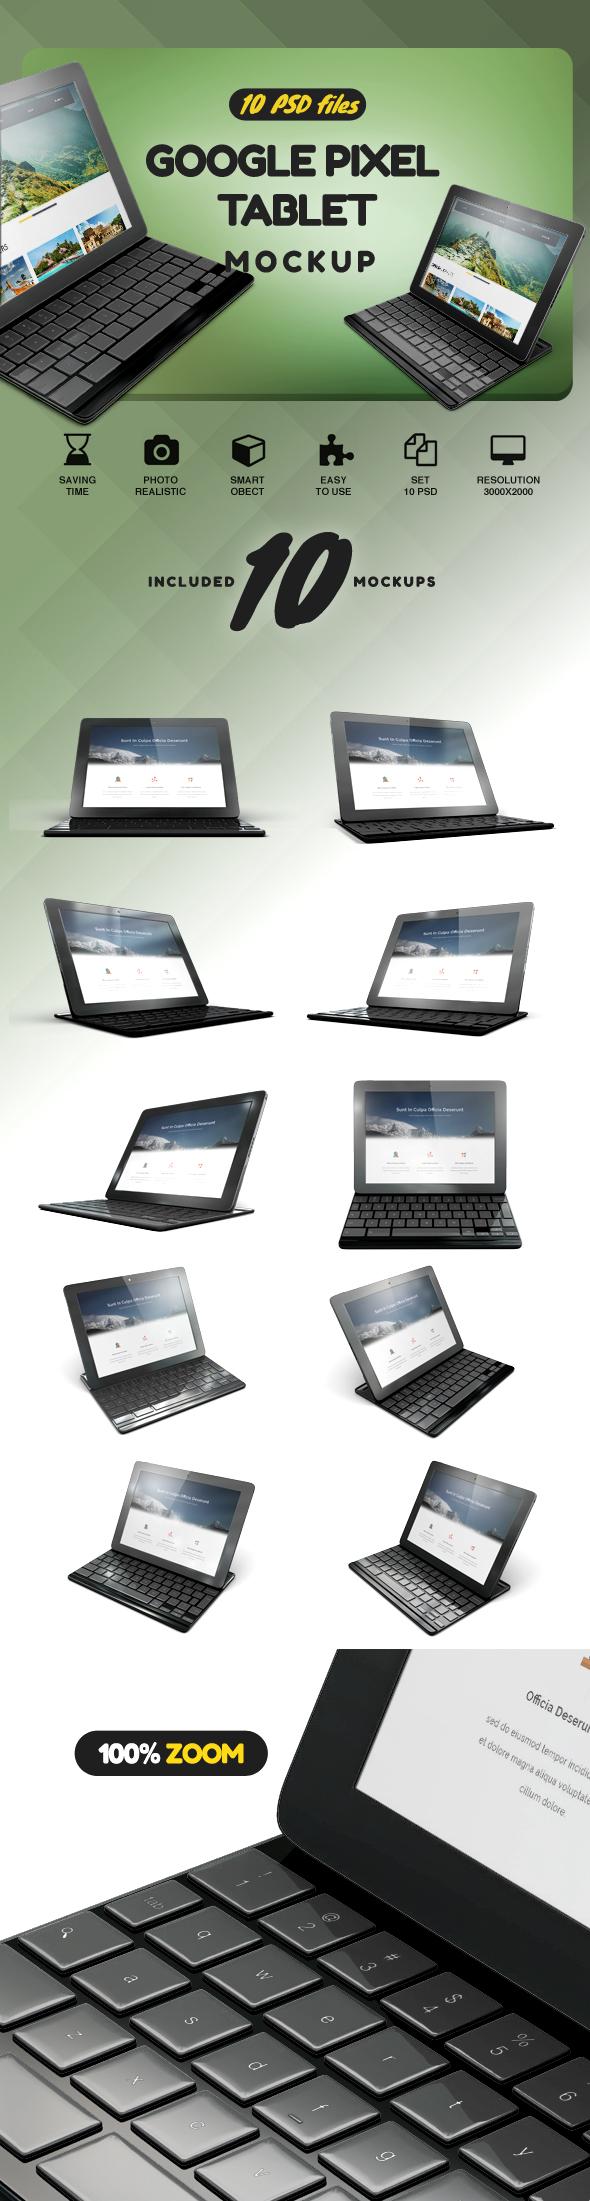 Google Pixel C Tablet Mockup example image 2